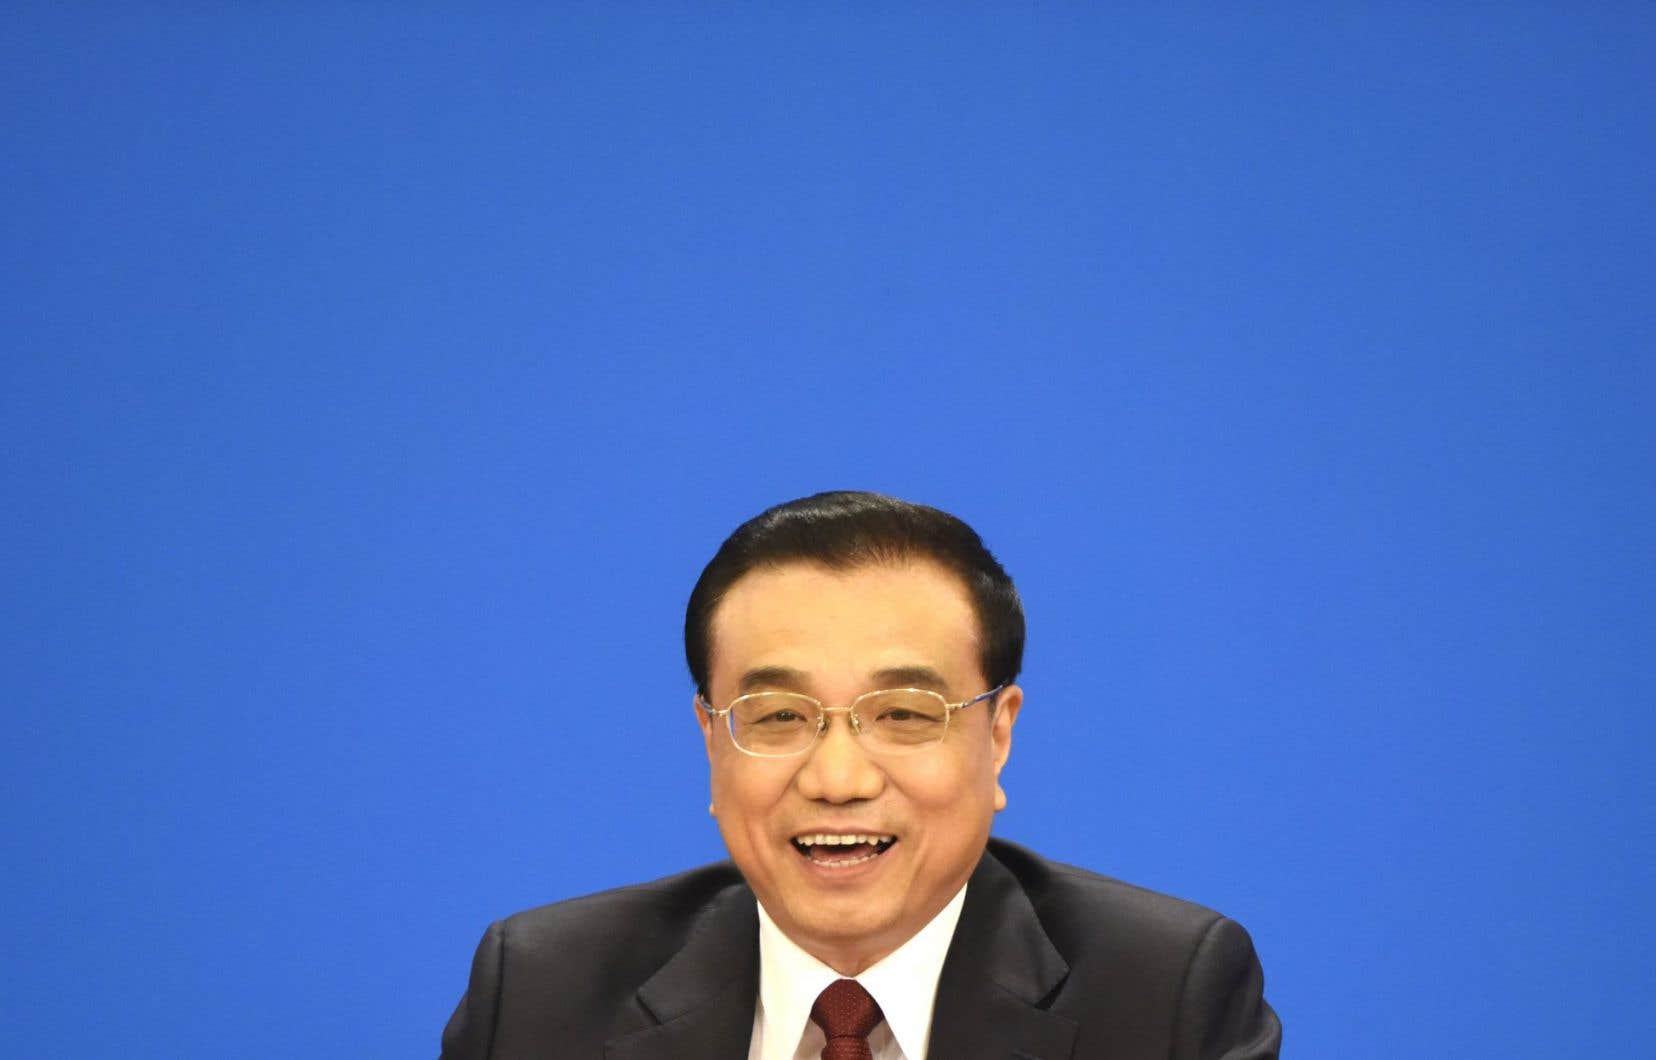 Li Kequiang